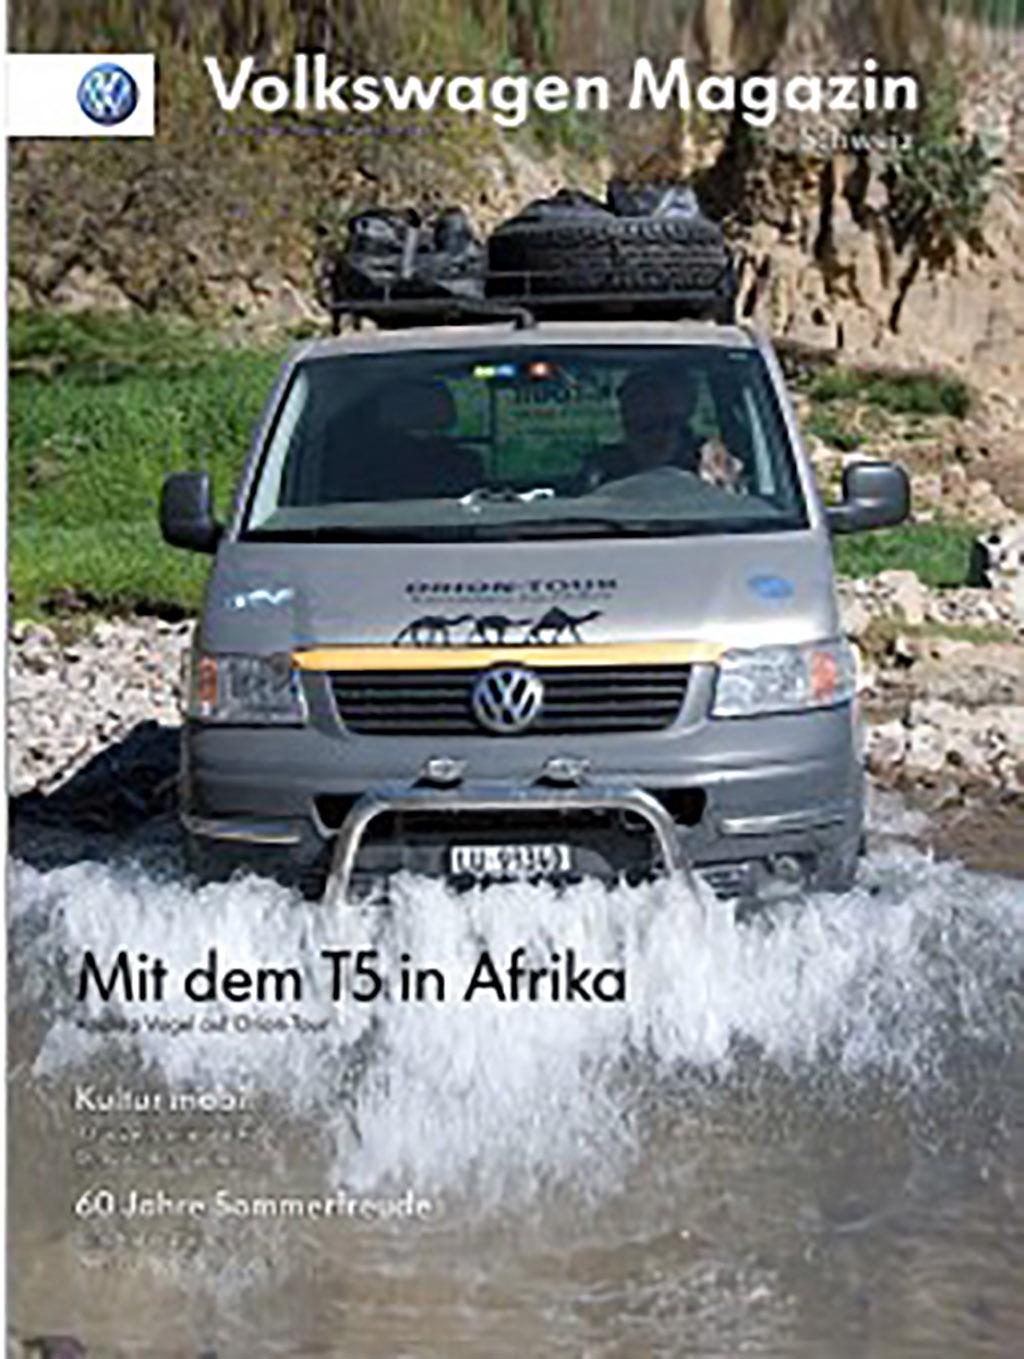 VW-Magazin